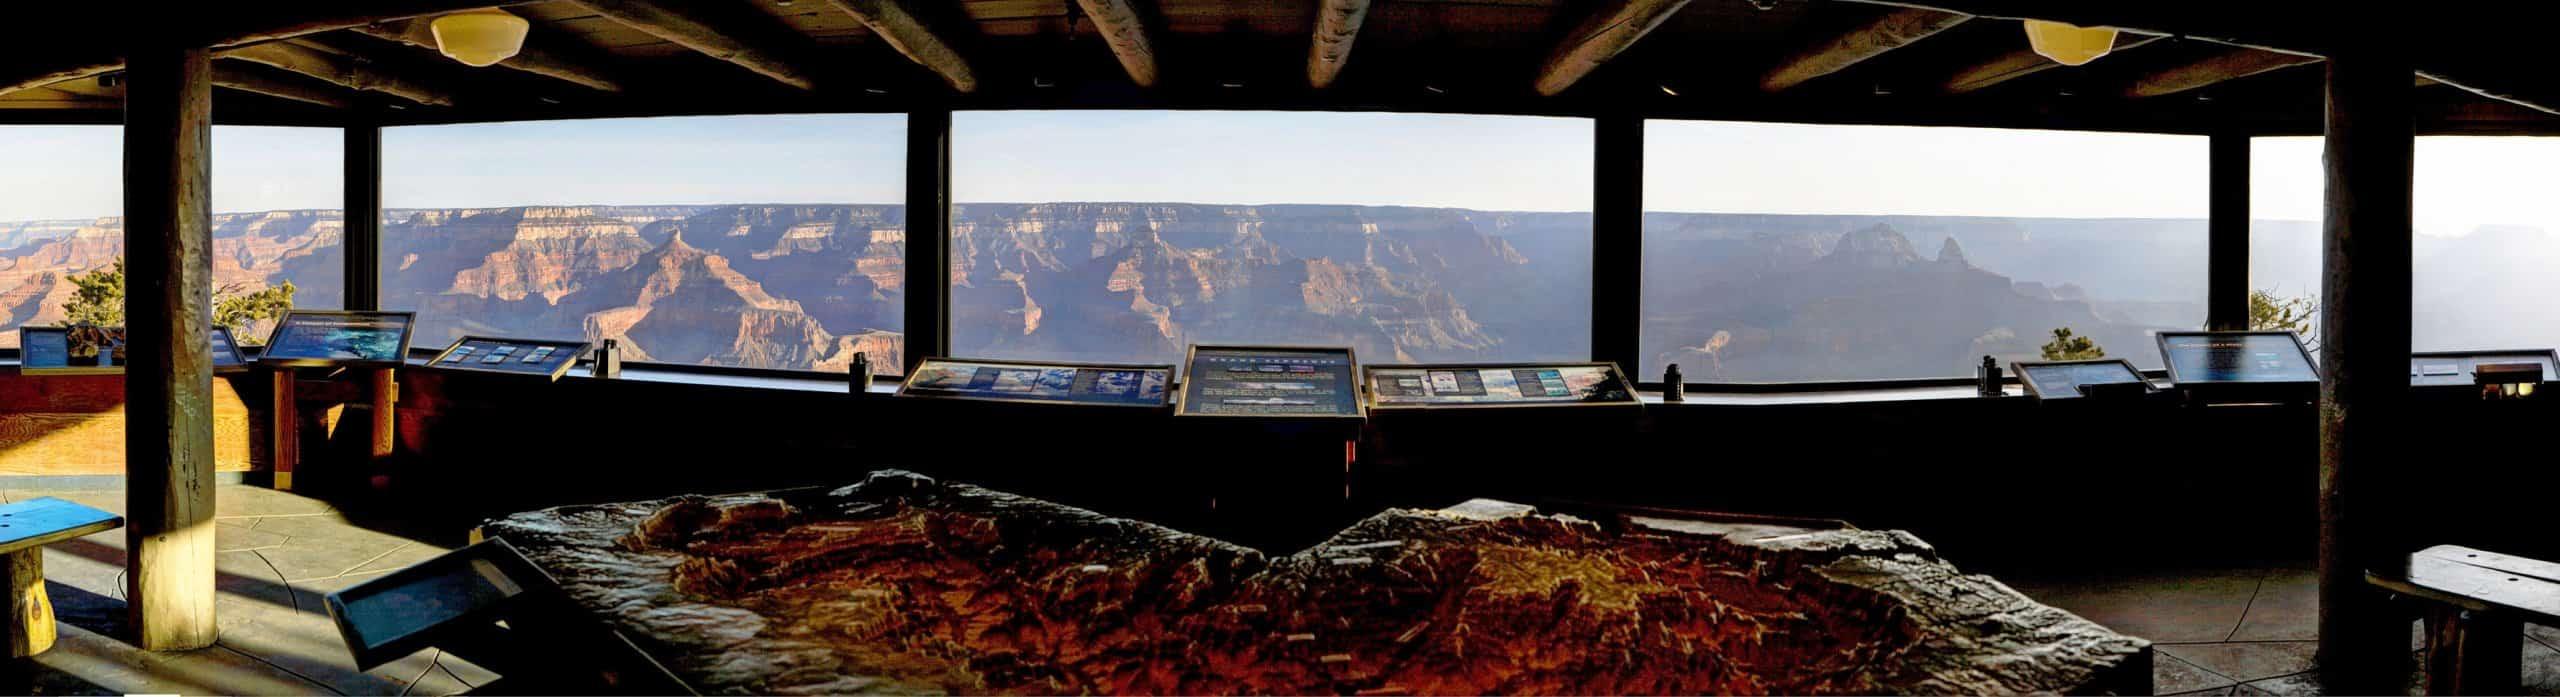 Half-Day at Grand Canyon - Yavapai Geology Museum -NPS photo by William Joye